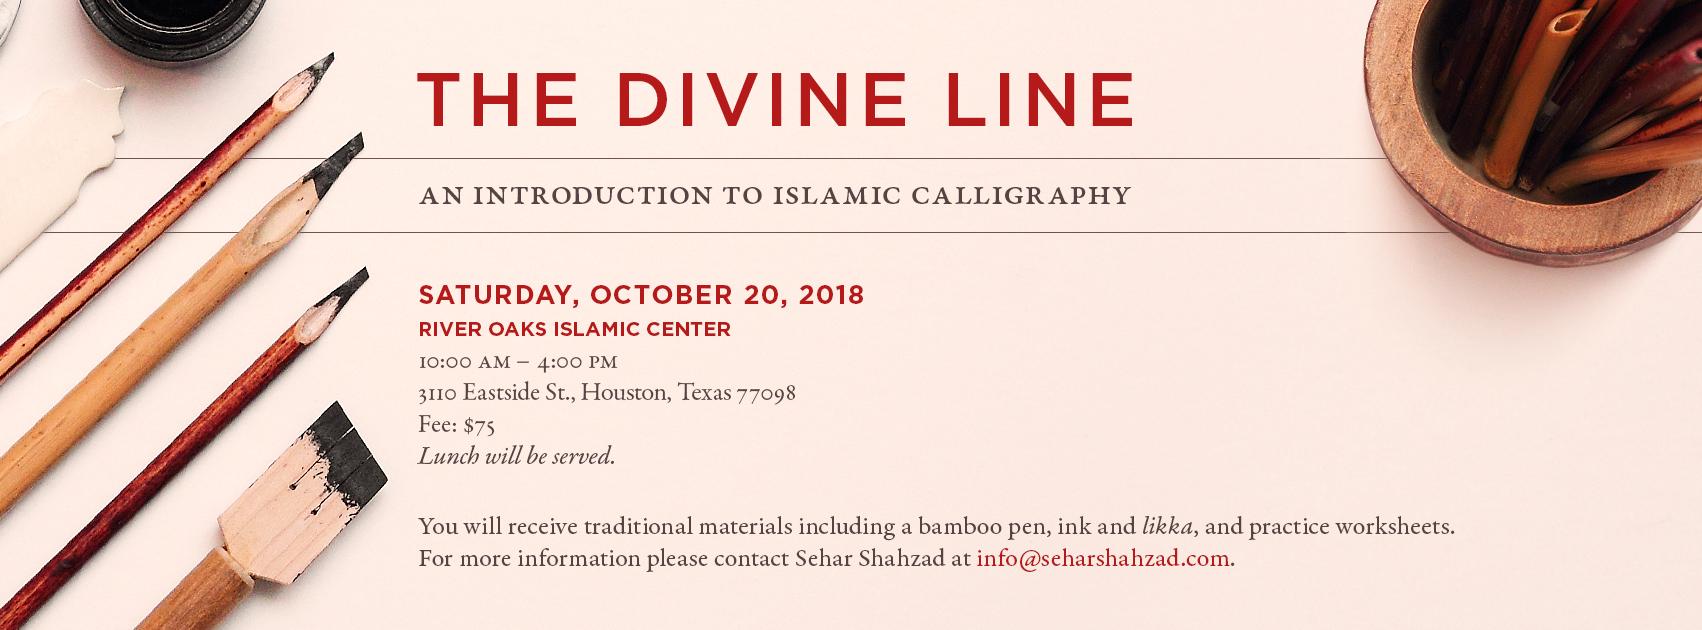 Sehar_Shahzad_Houston_Calligraphy_Workshop_FB_Cover_v0.02.jpg